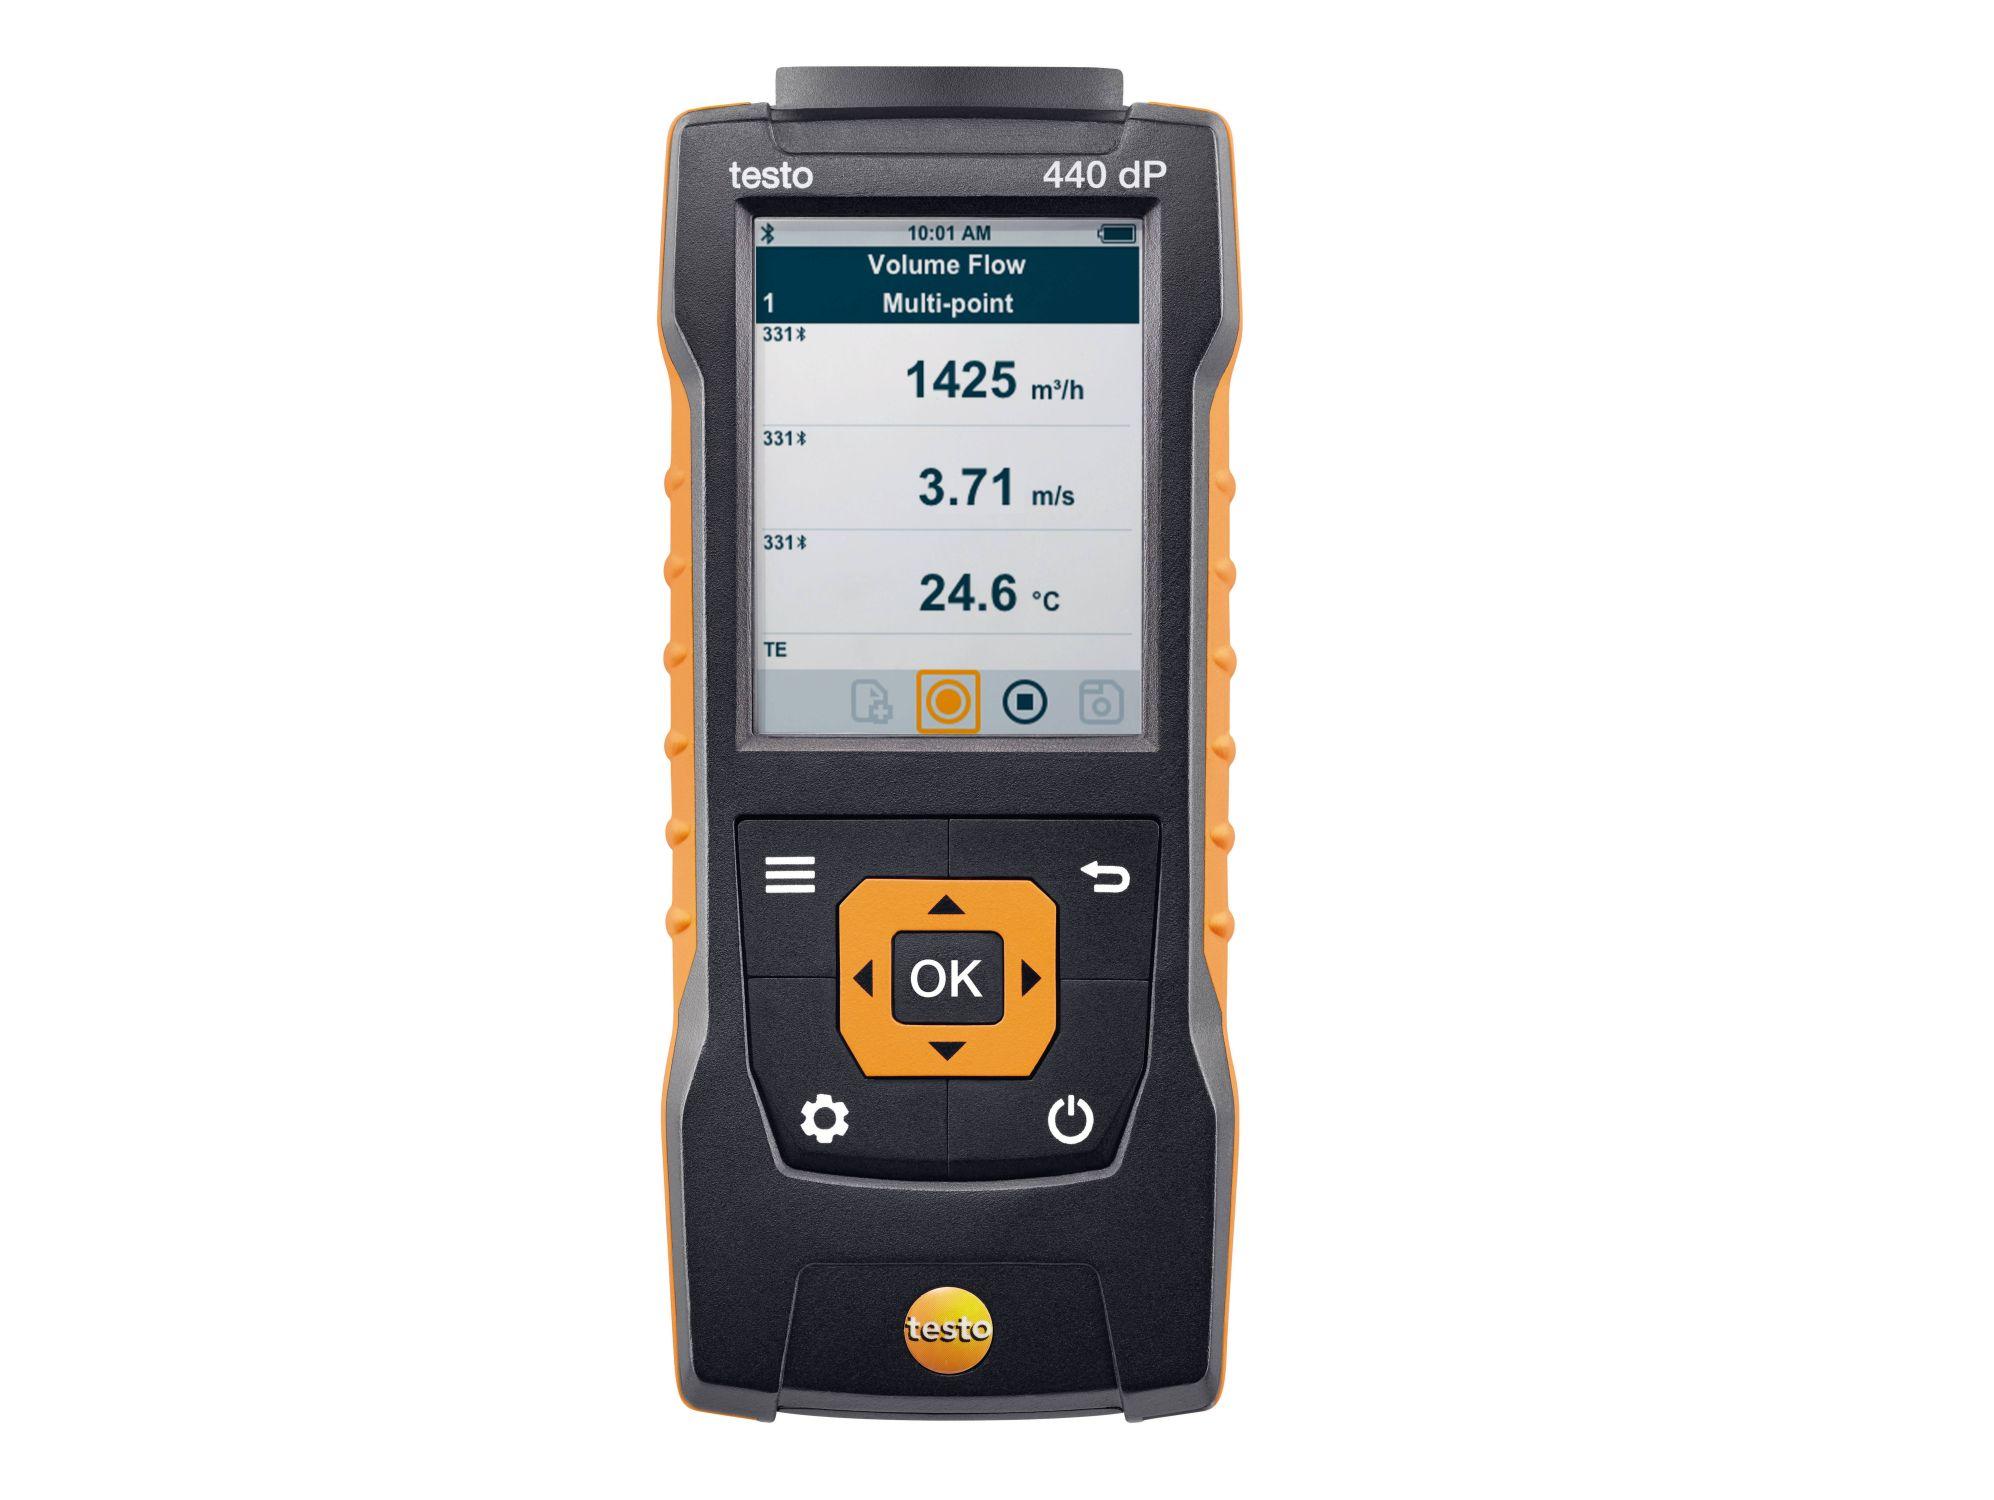 TESTO  440-dP - Air velocity and IAQ measuring instrument